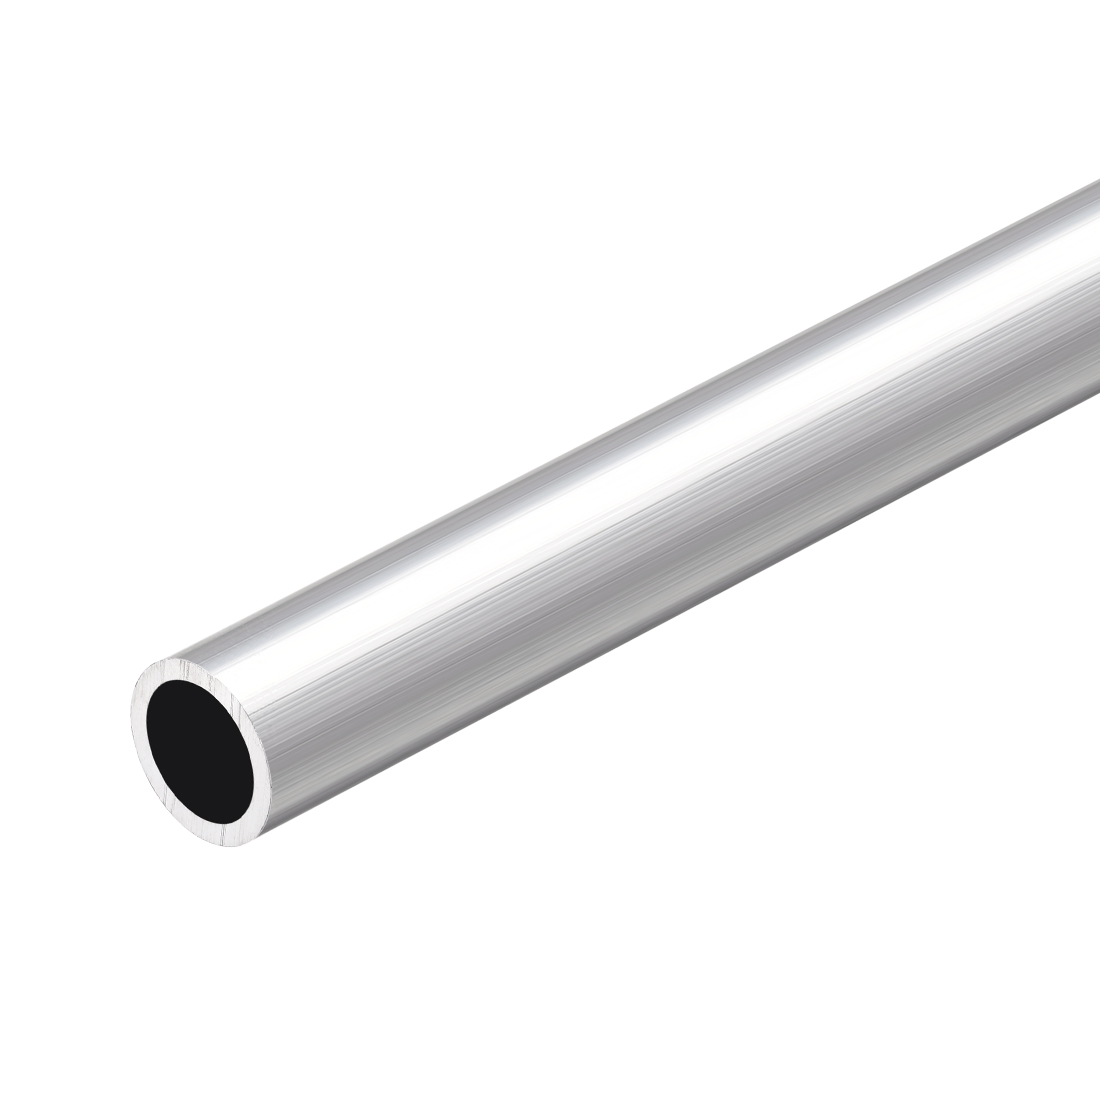 Uxcell 6063 Aluminum Round Tube 300mm Length 13mm OD 10mm Inner Dia Seamless Aluminum Straight Tubing